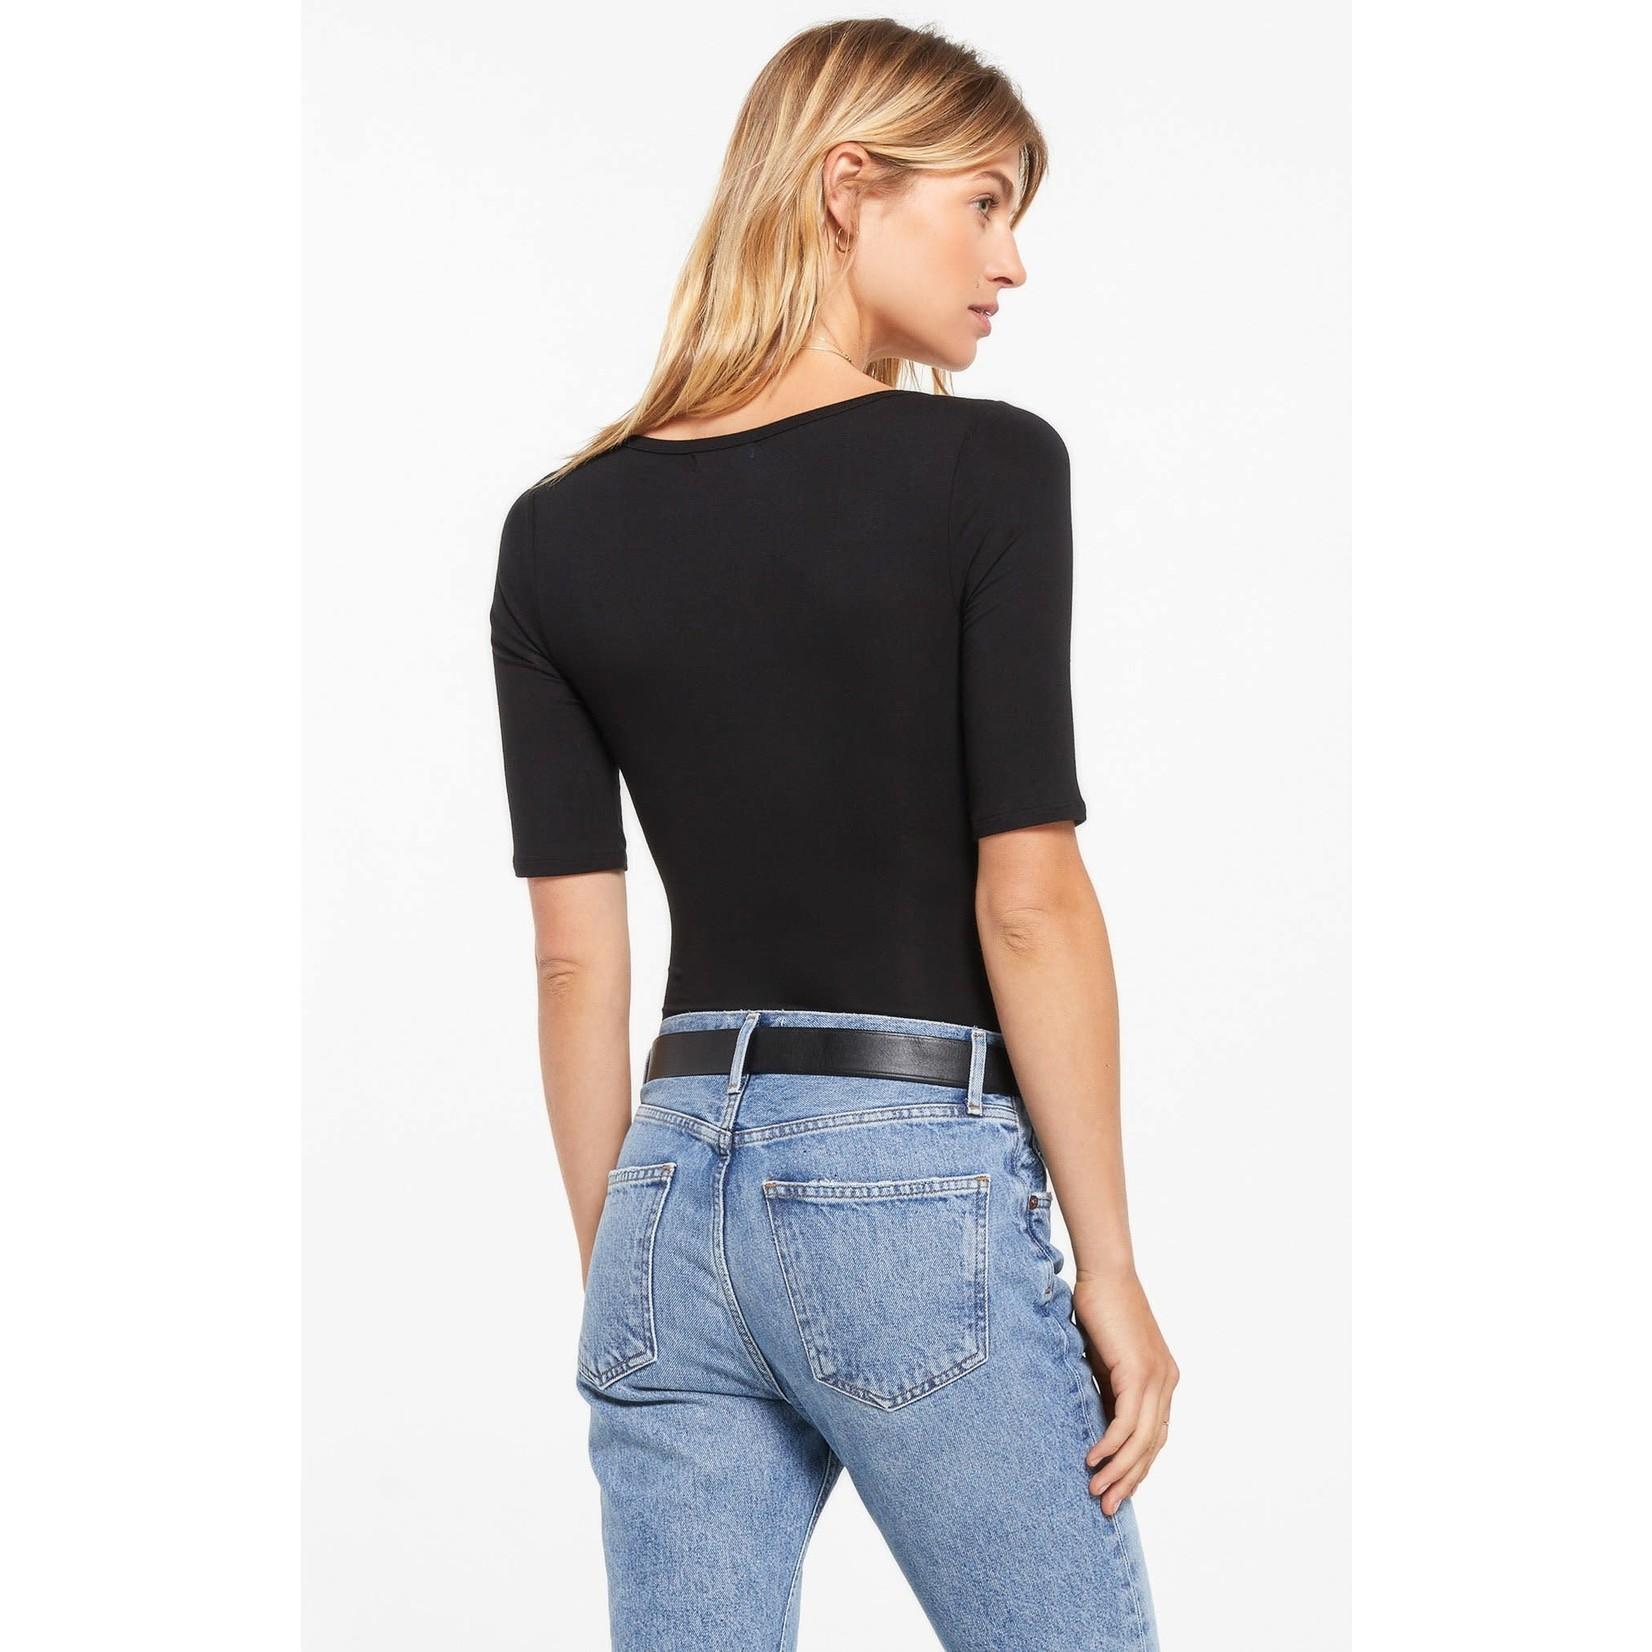 Z Supply Cara Sleek Scoop Bodysuit